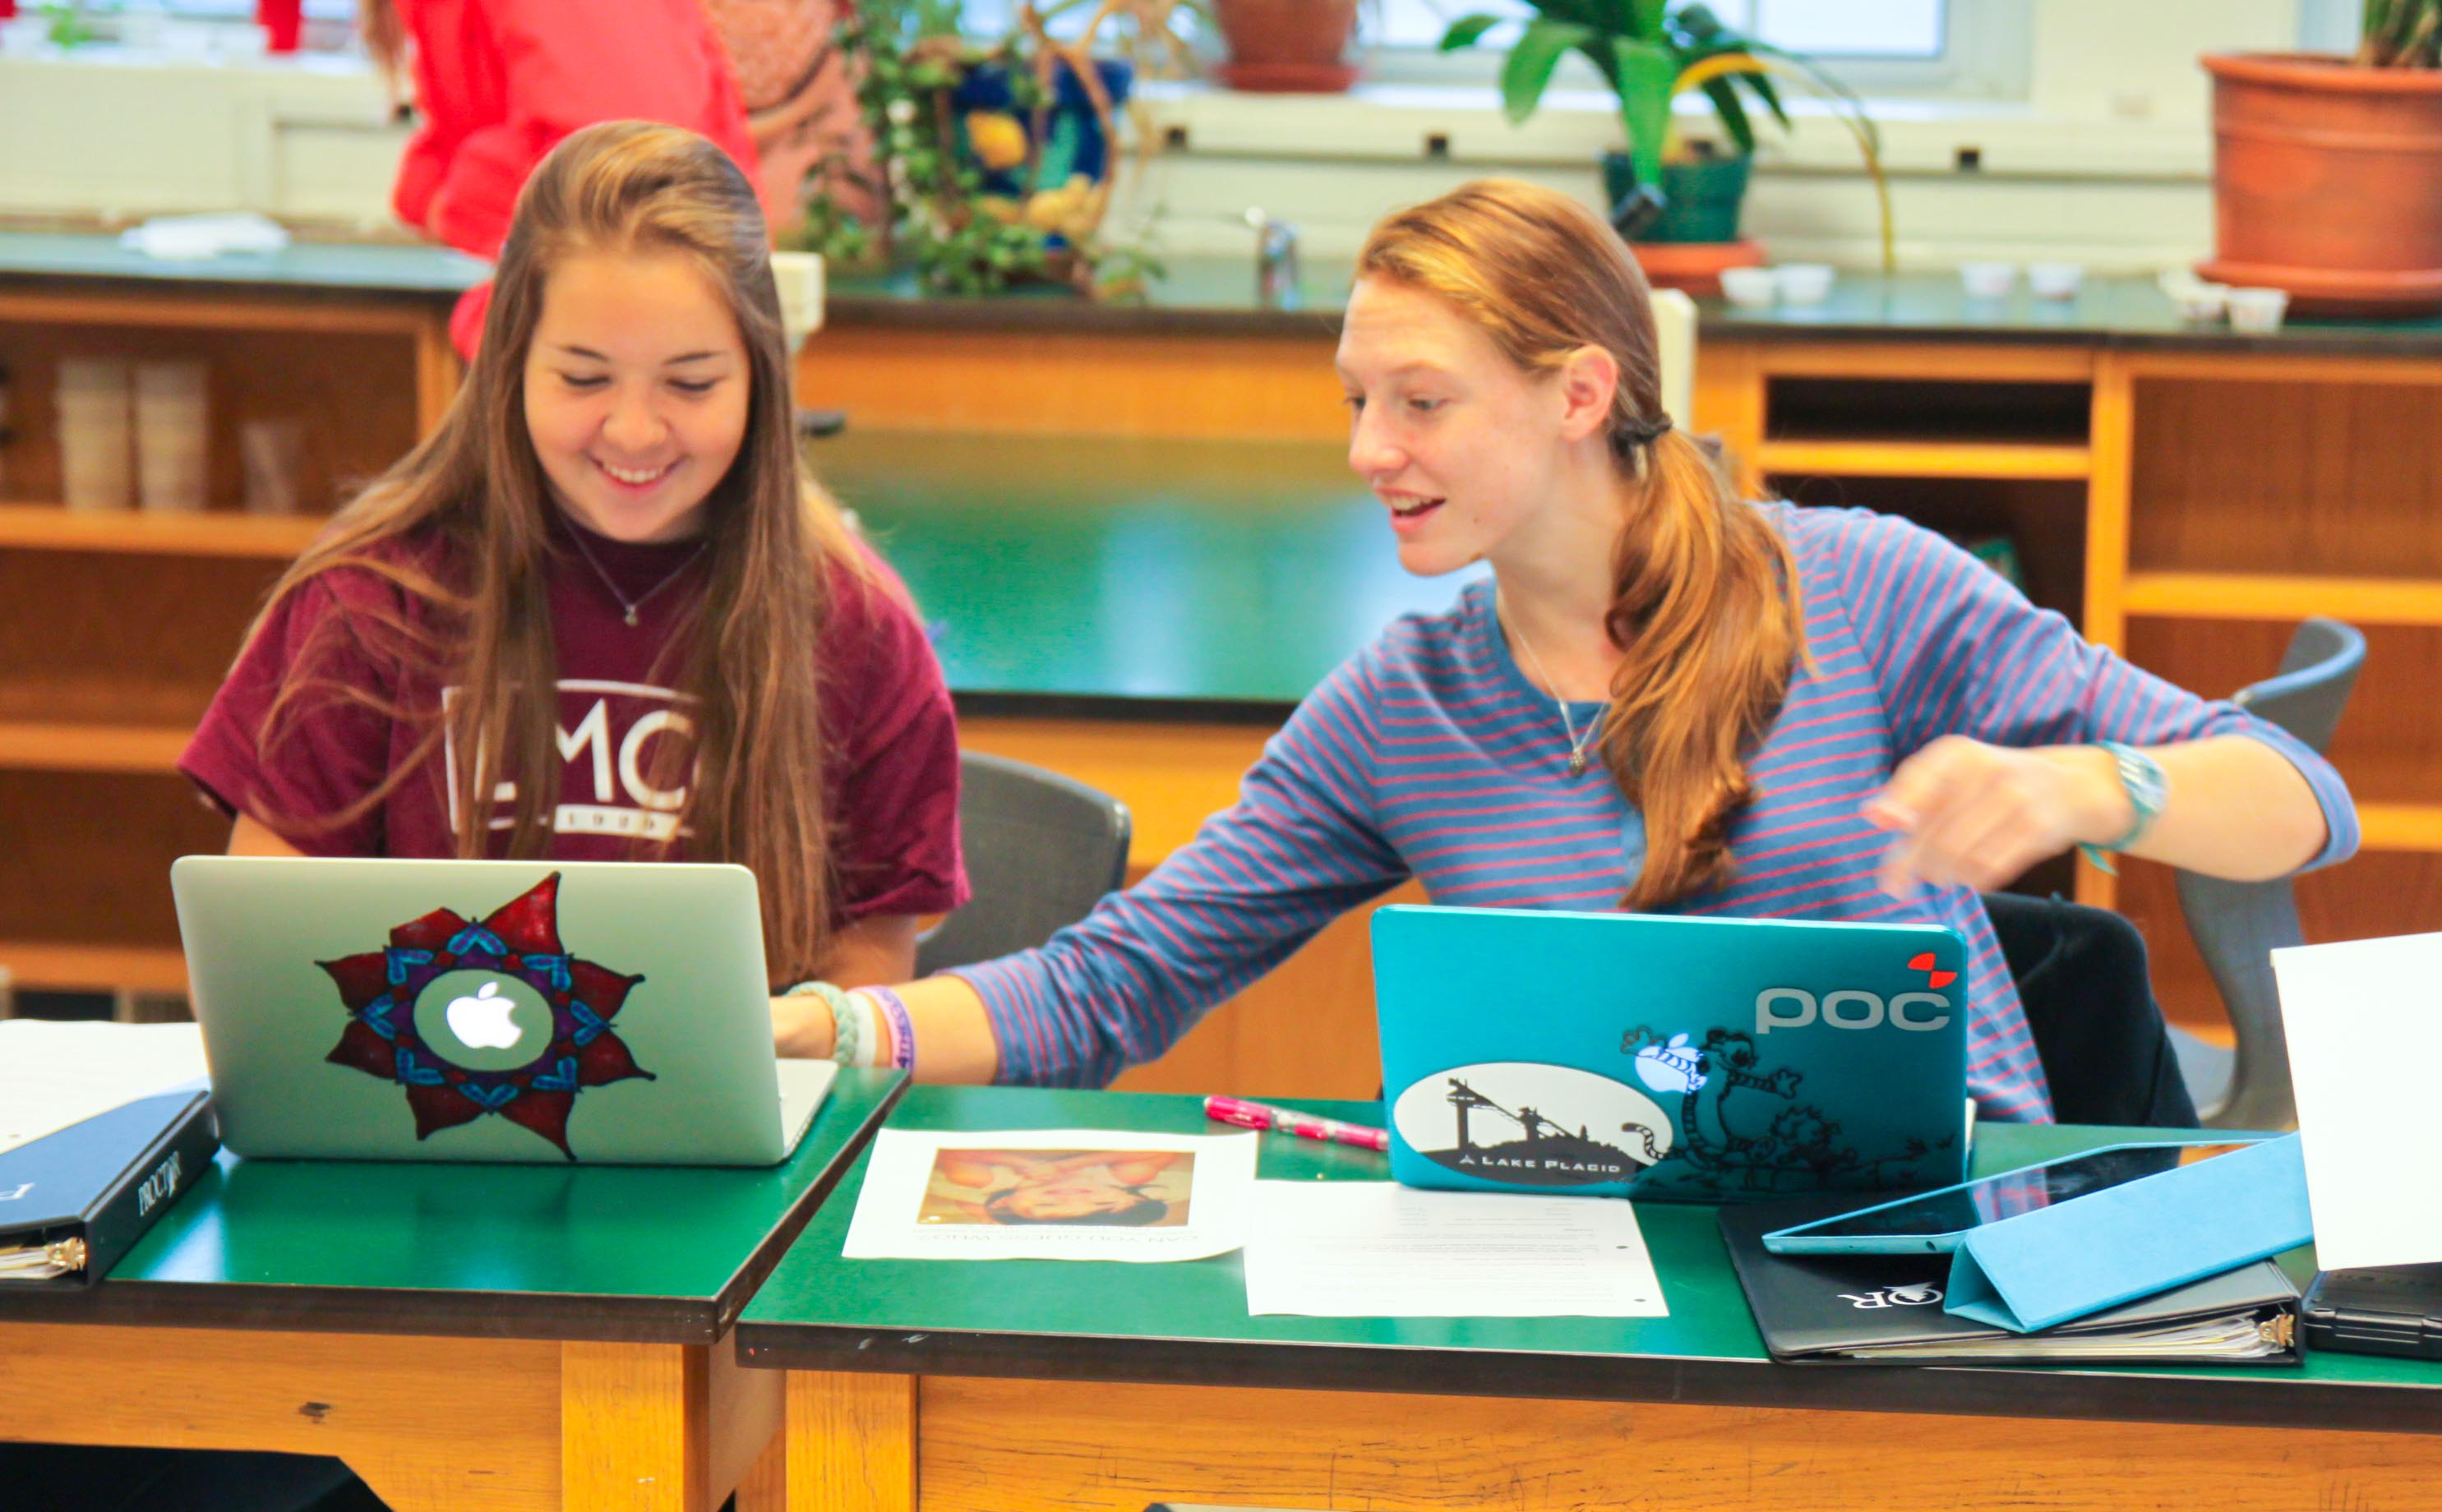 Proctor Academy health and wellness